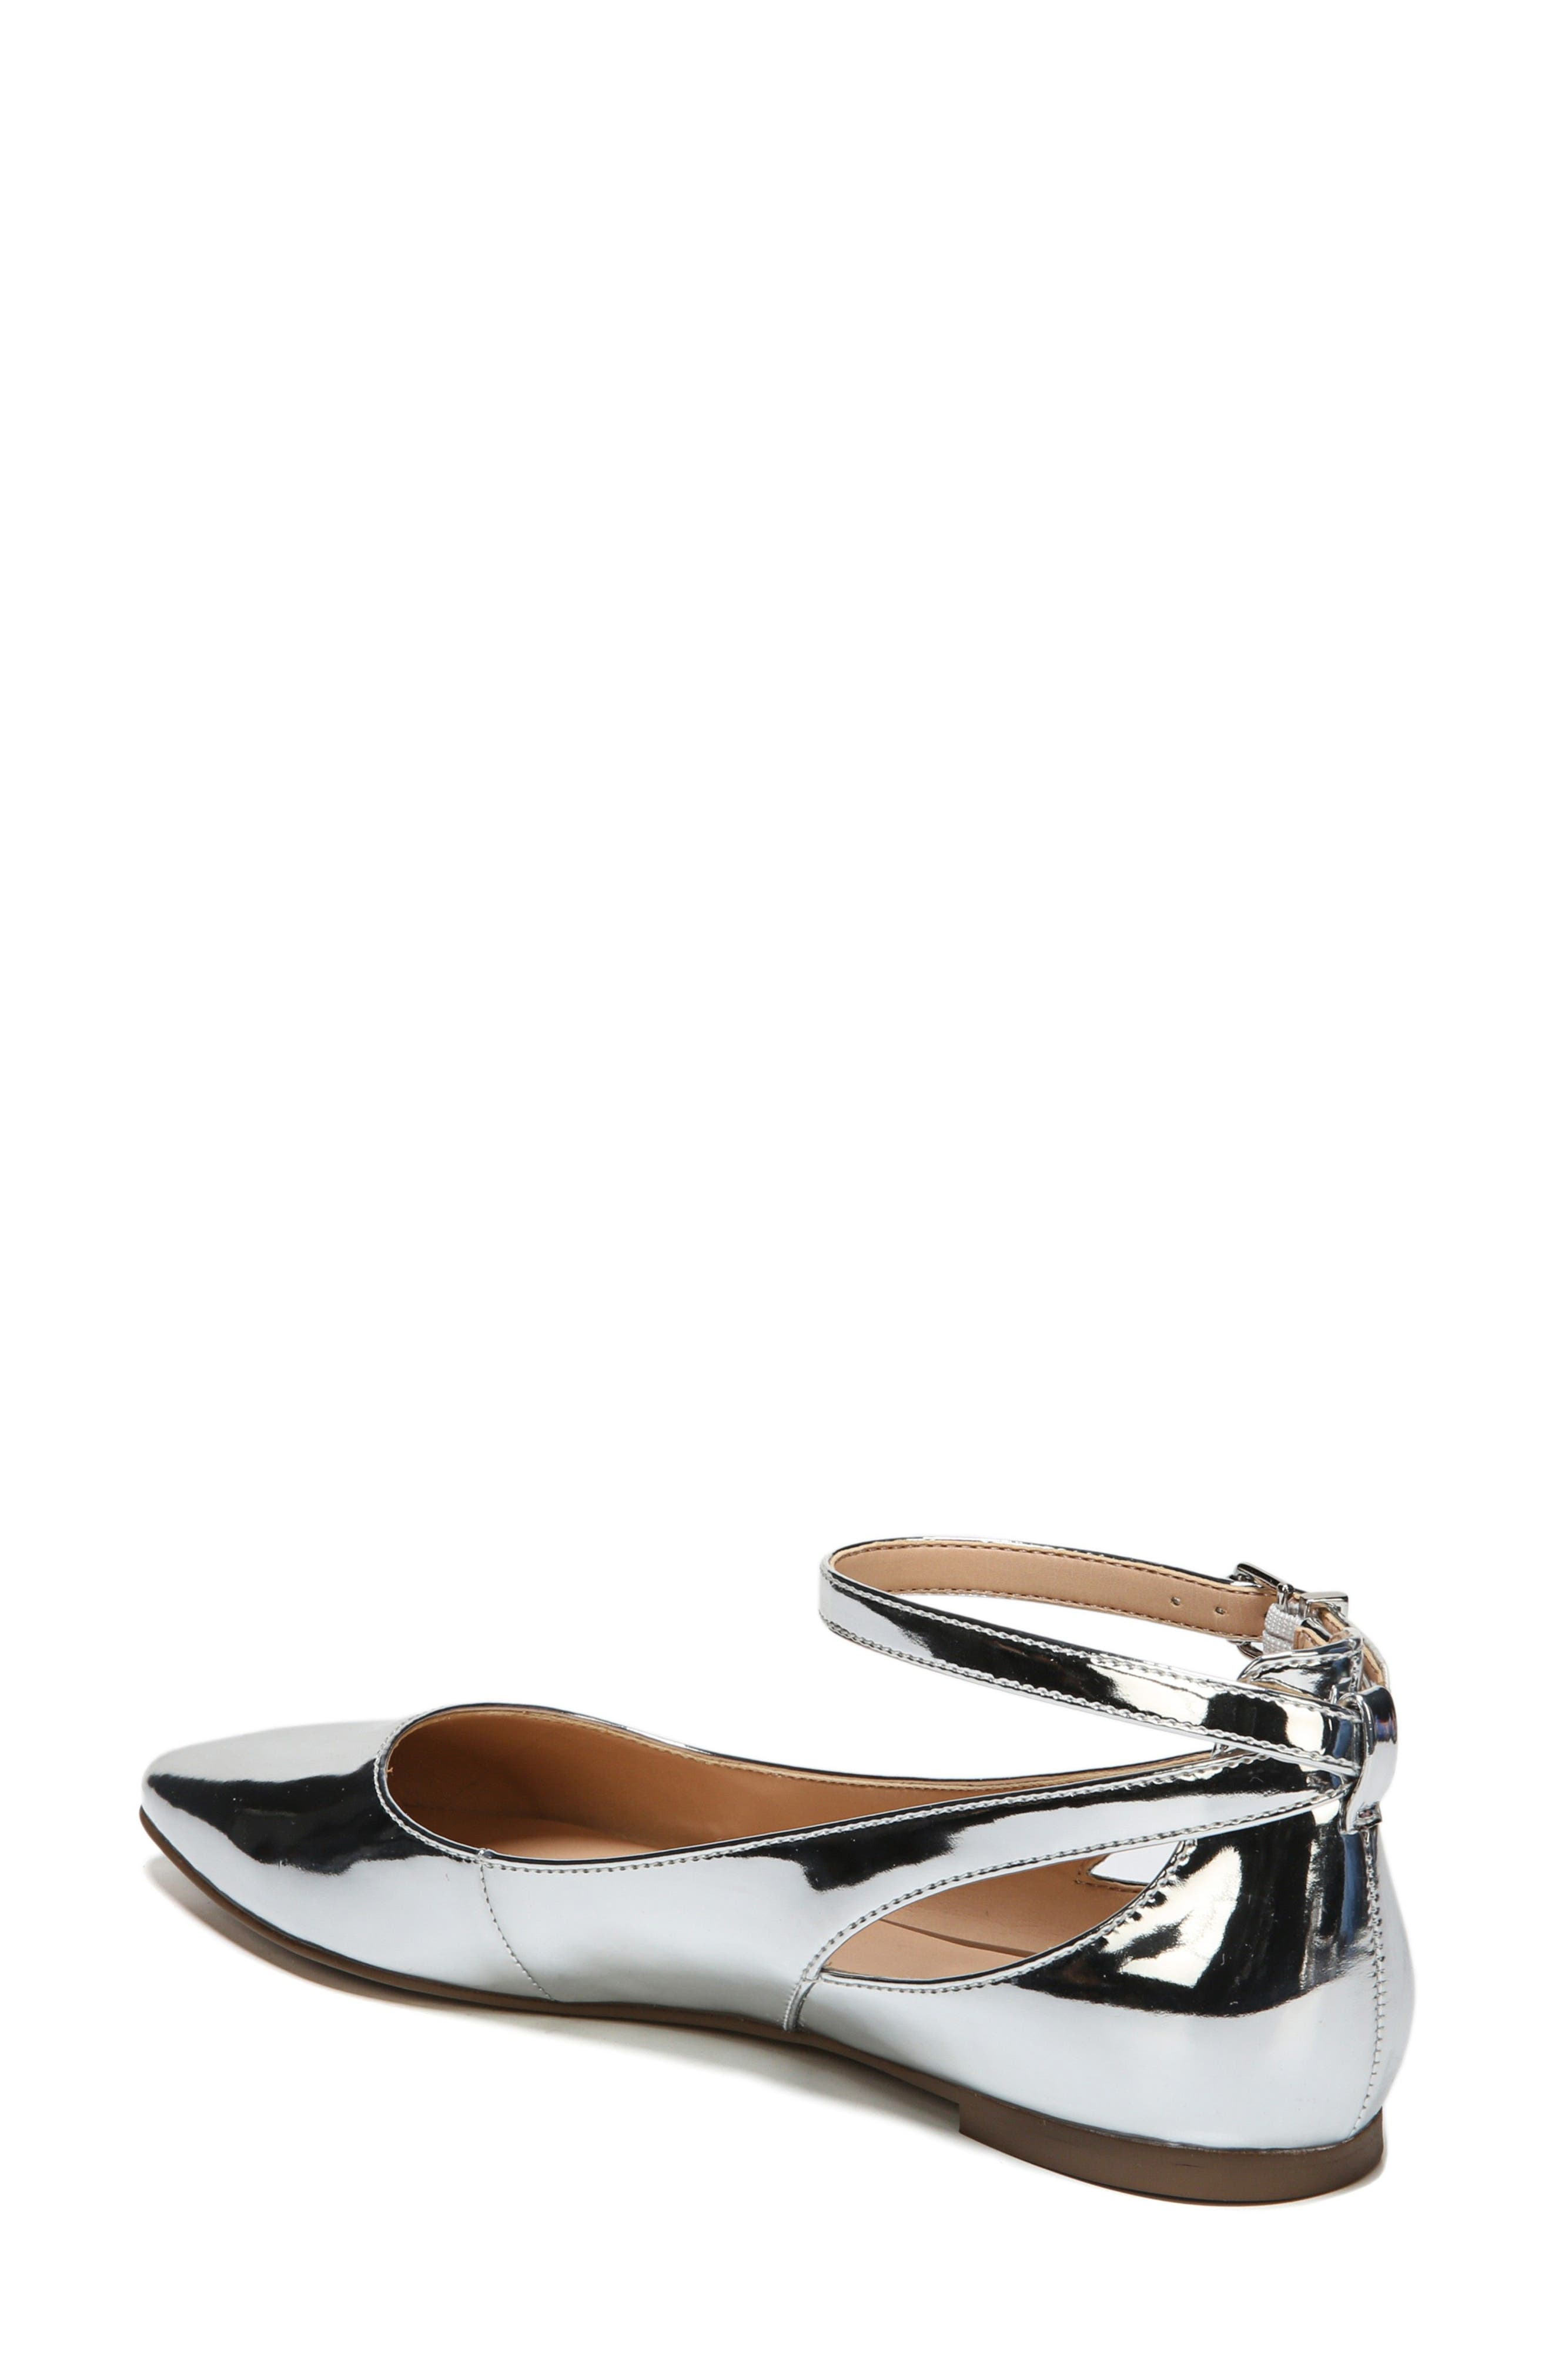 Alternate Image 2  - SARTO by Franco Sarto Sylvia Ankle Strap Flat (Women)